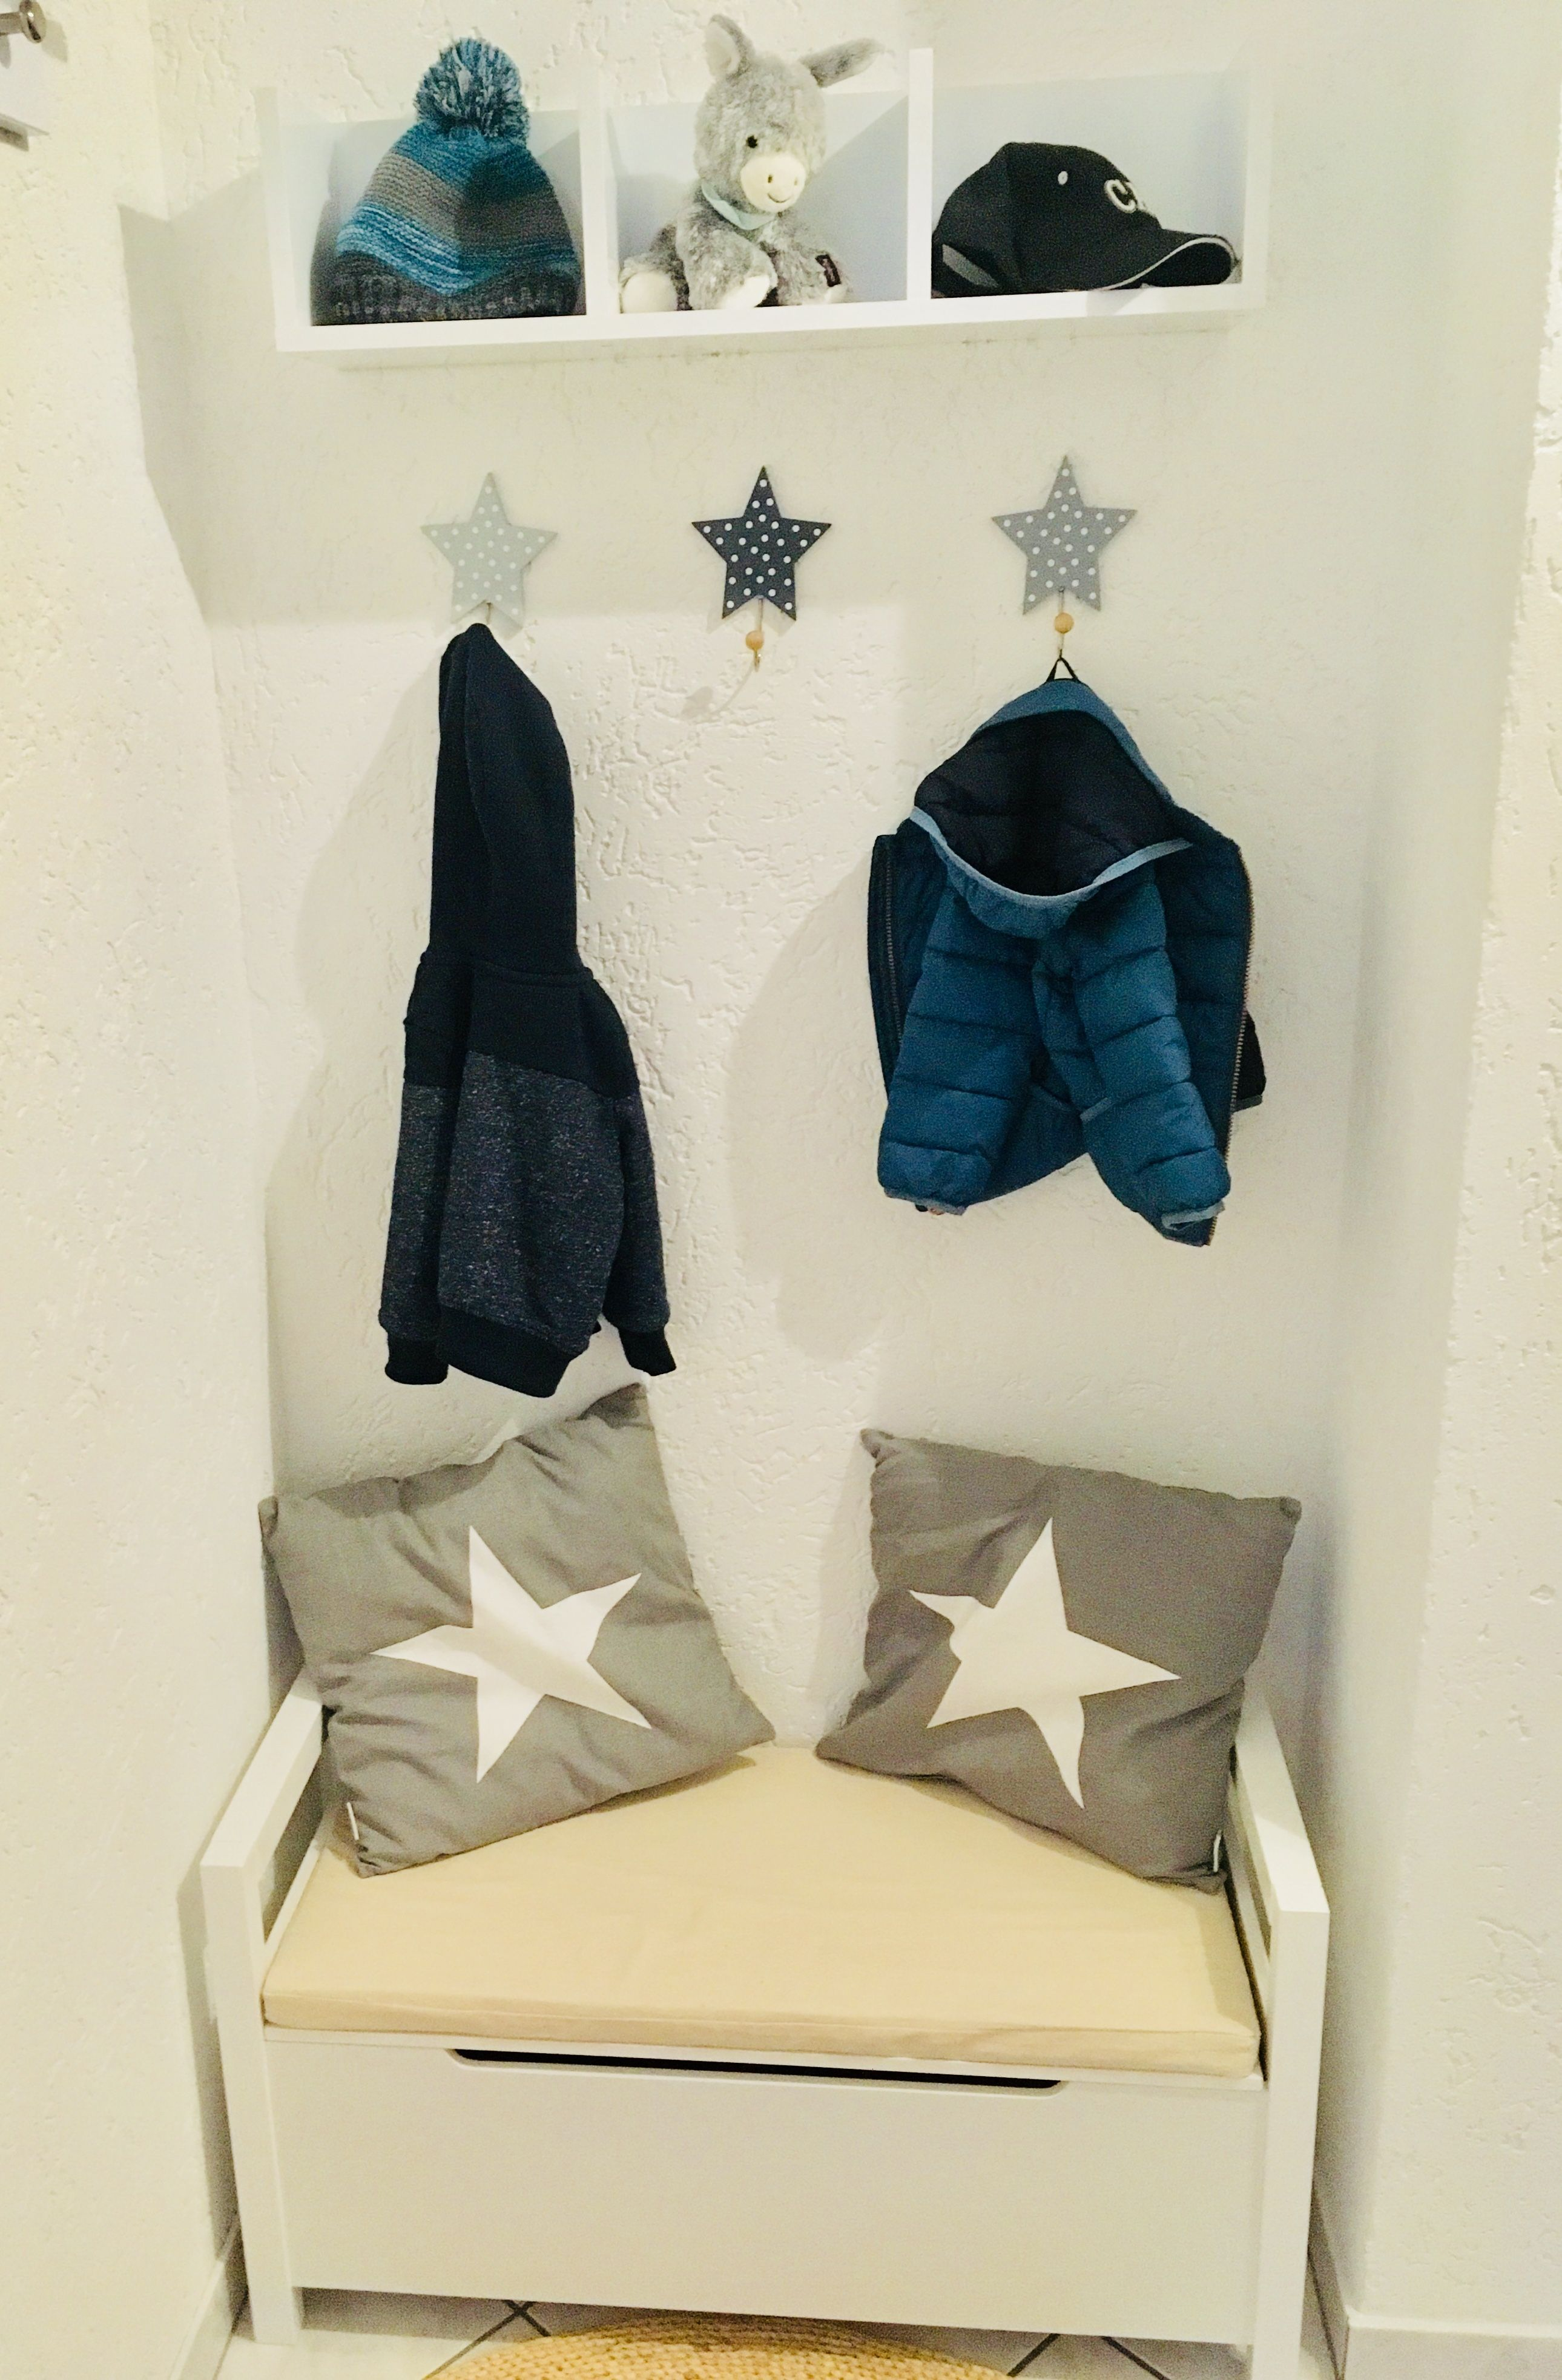 Most Recent Photos Garderobe Kinder Diy Suggestions An Ikea